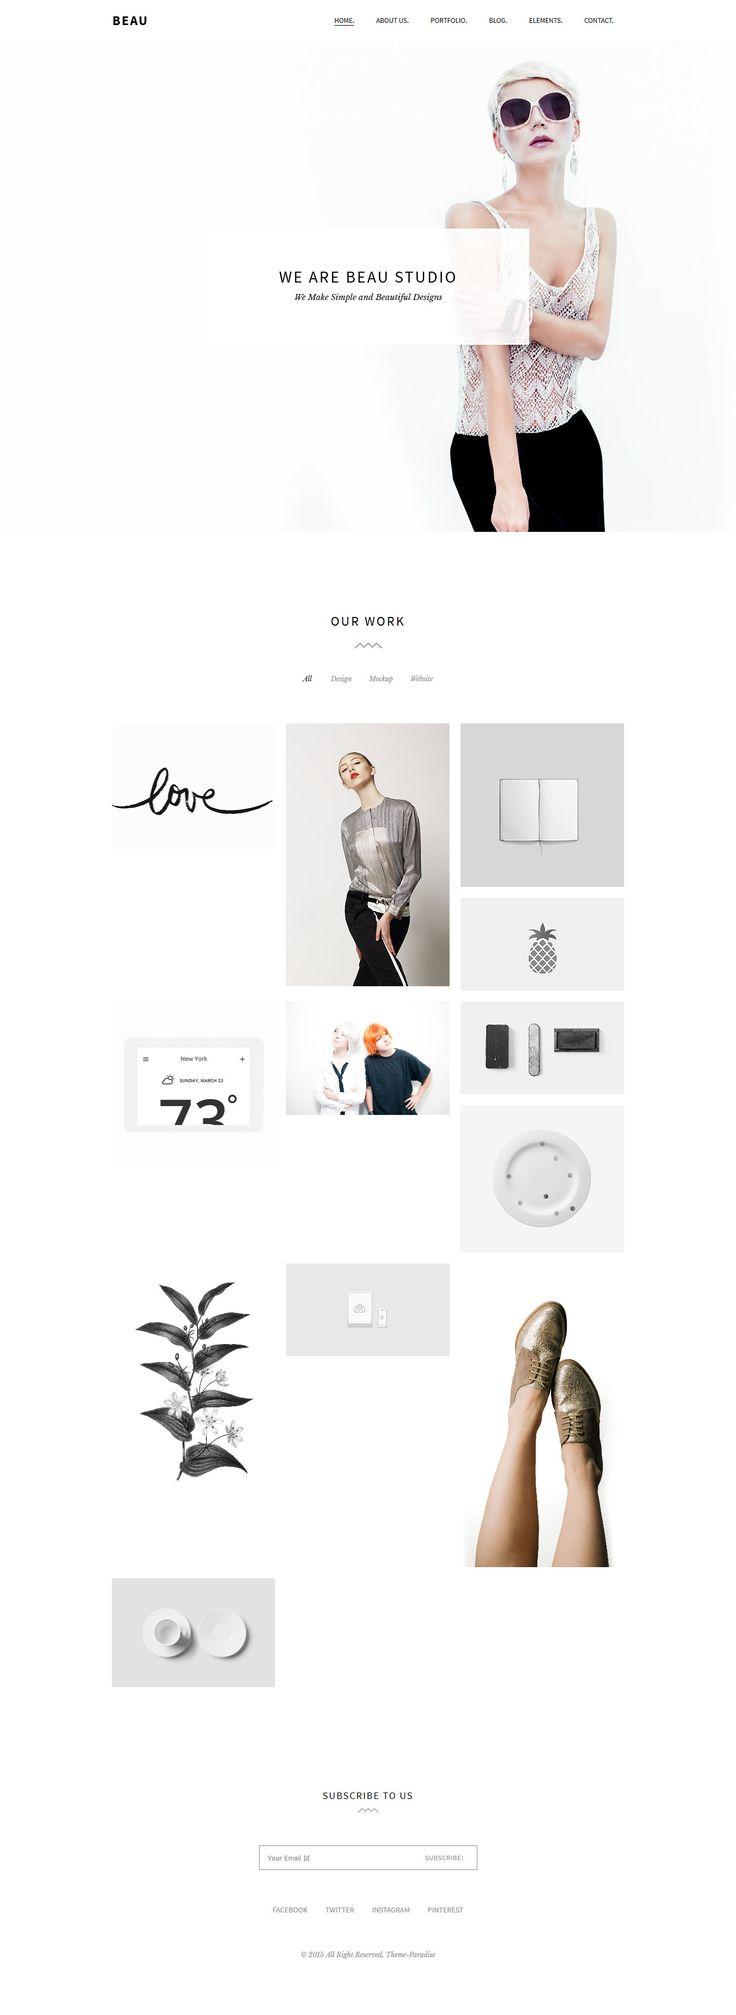 Beau - Minimal Portfolio/Agency WordPress Theme #webdesign Download: http://themeforest.net/item/beau-minimal-portfolioagency-wordpress-theme/13470230?ref=ksioks